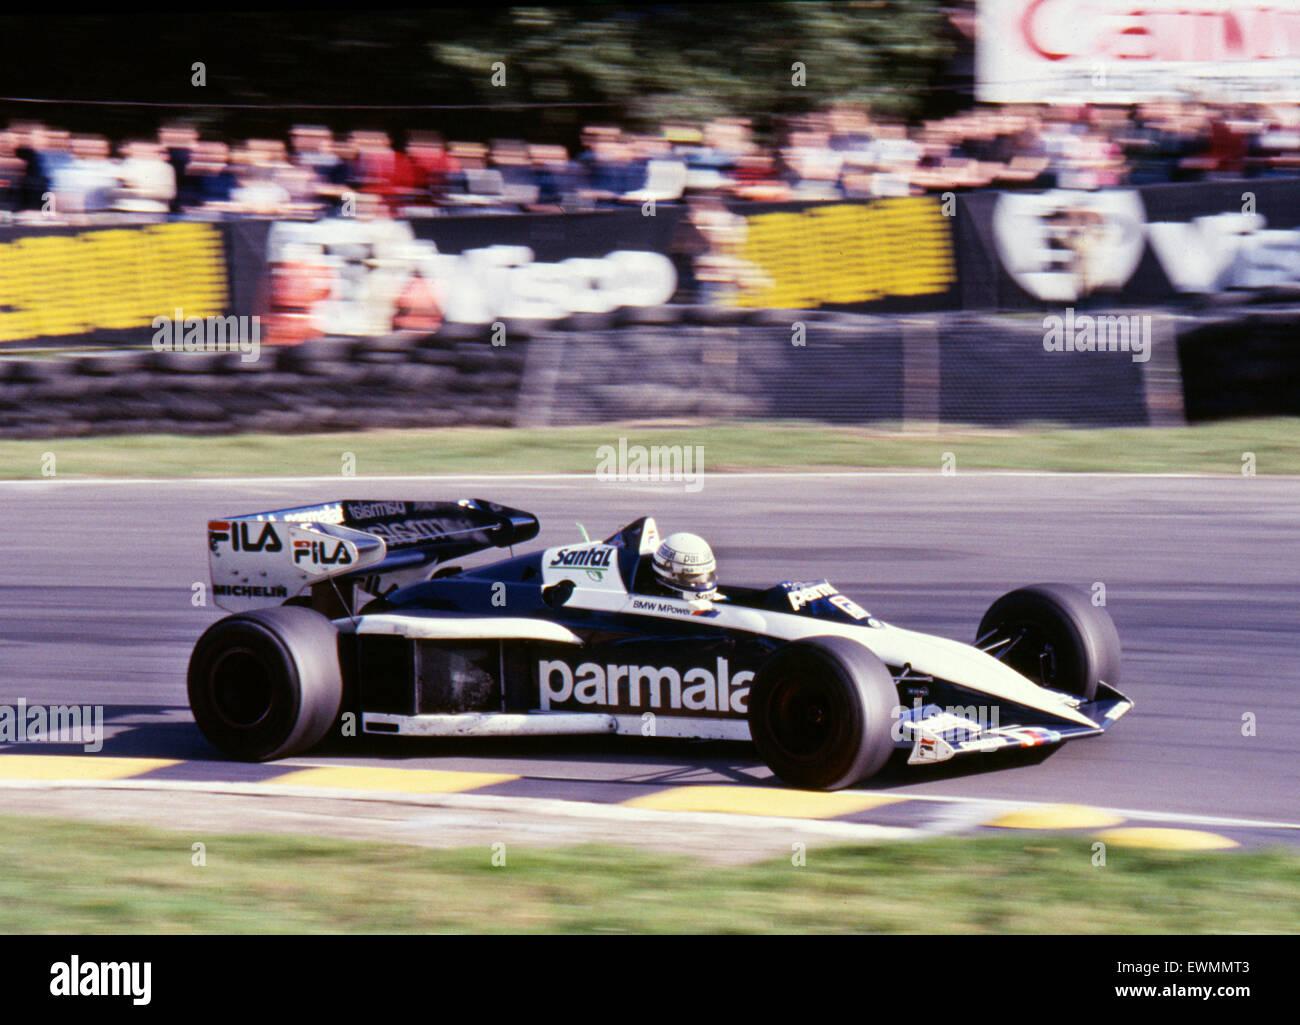 Brabham BT52, Ricardo Patrese. 1983-GP von Europa-Marken Luke, 25.09.1983. Stockbild